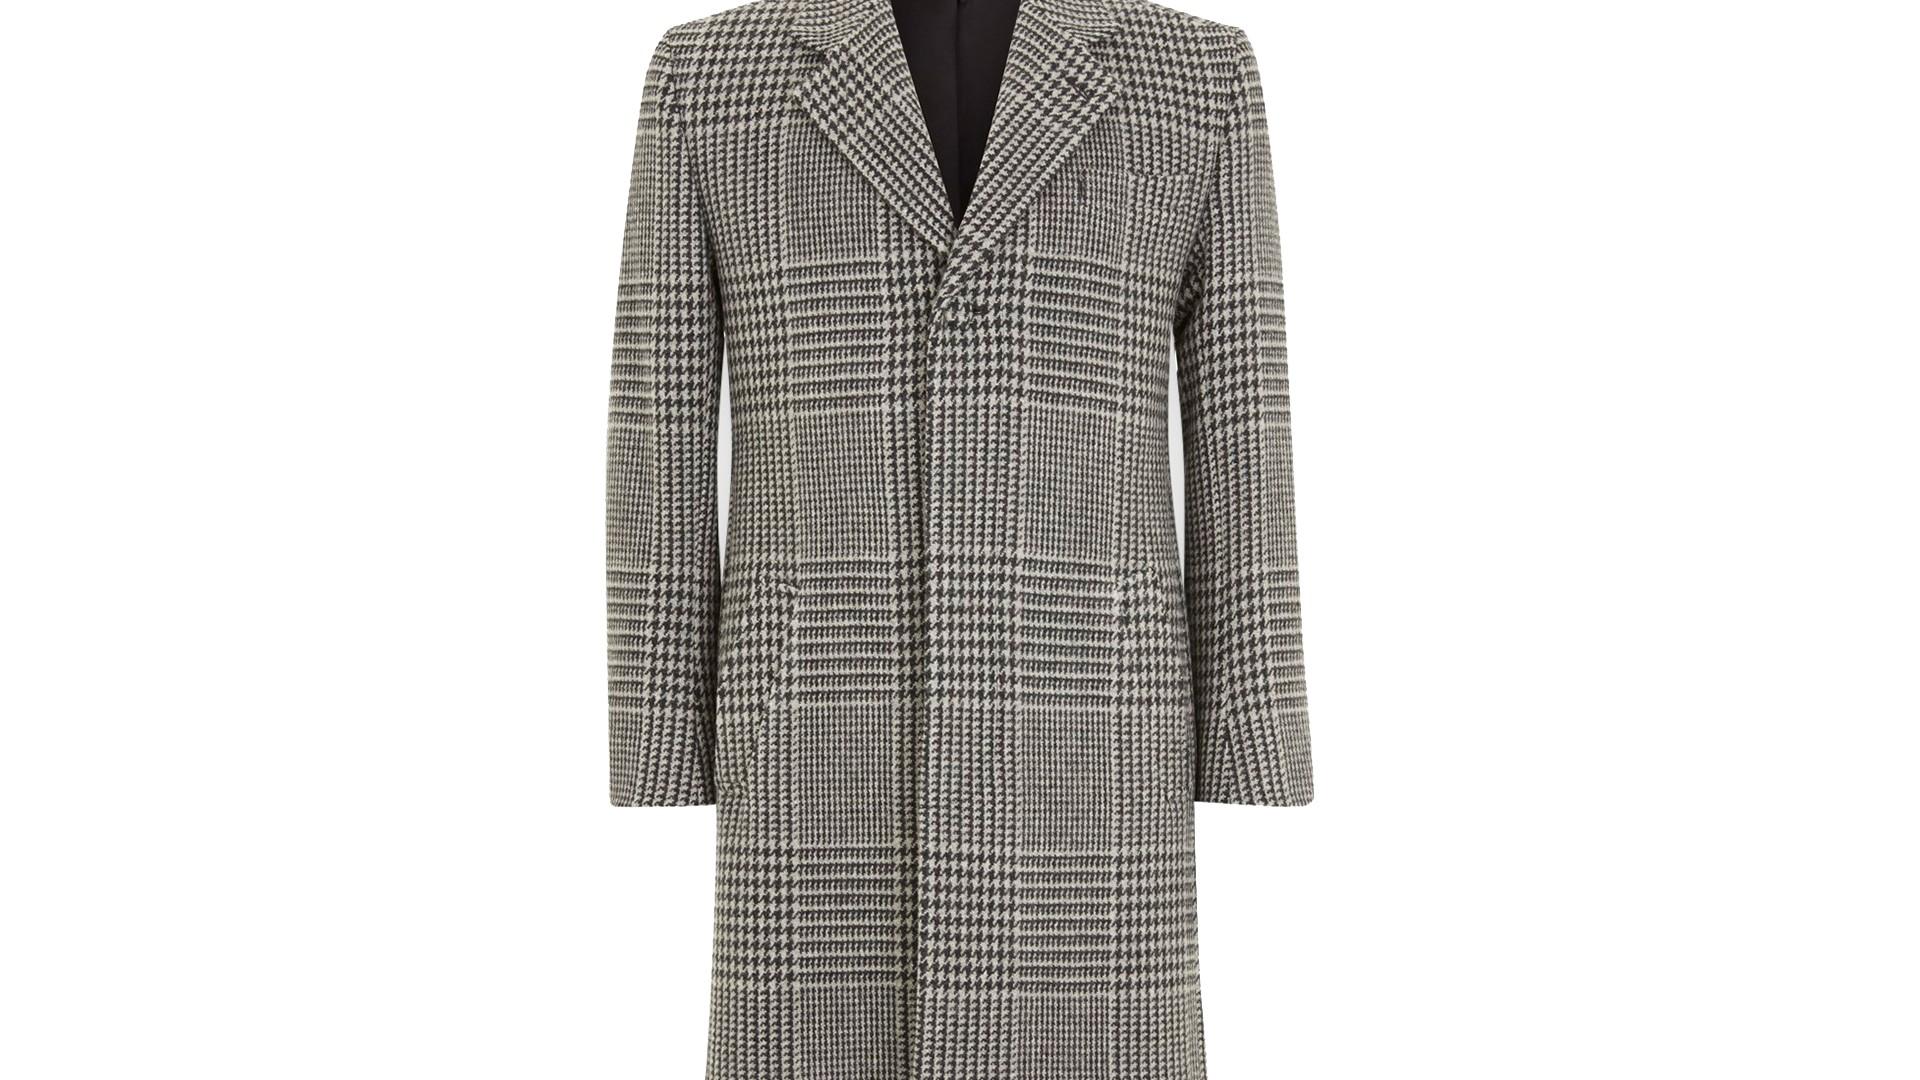 The Overcoat: Turnbull & Asser Hopton Hydrophobic Wool Coat